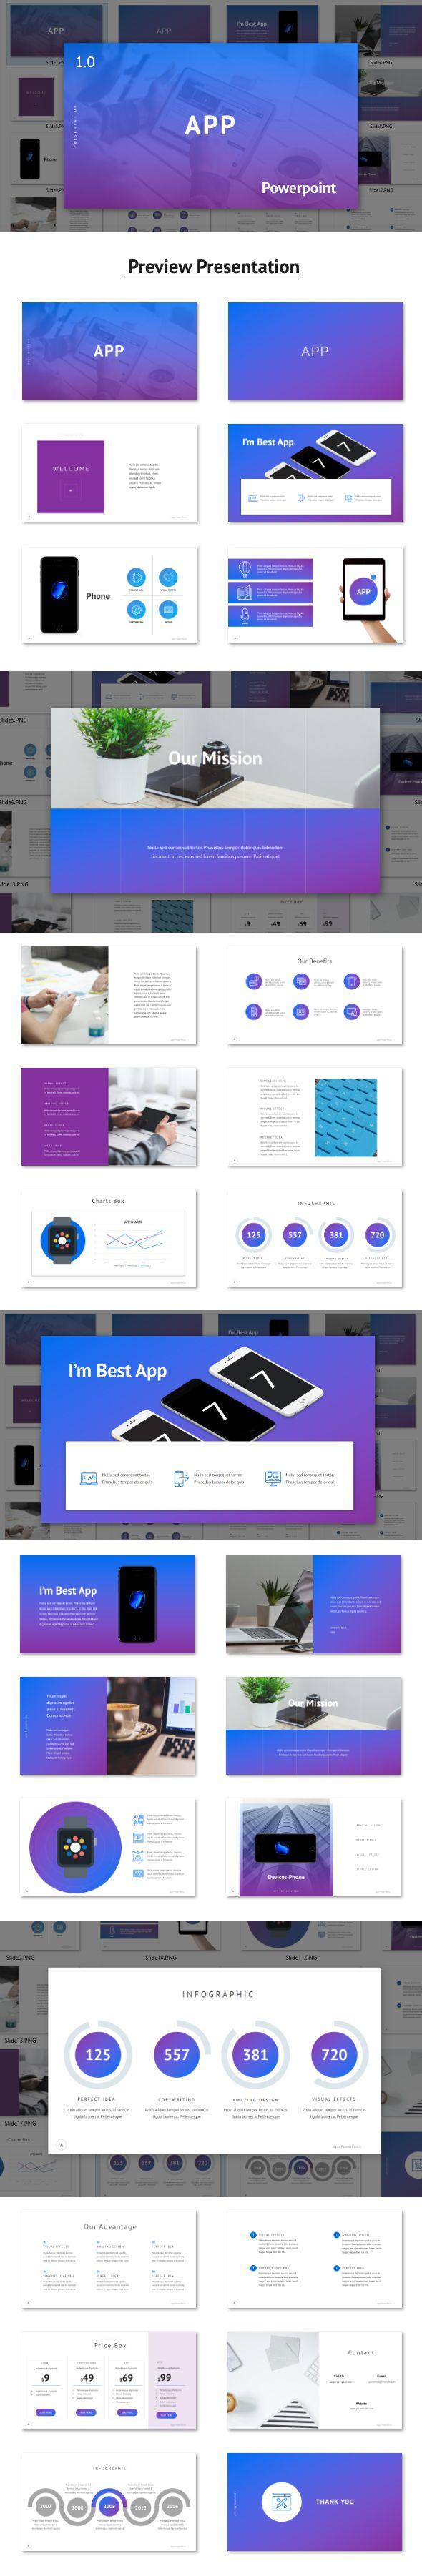 Best 25 cool powerpoint templates ideas on pinterest triangle app powerpoint template toneelgroepblik Images